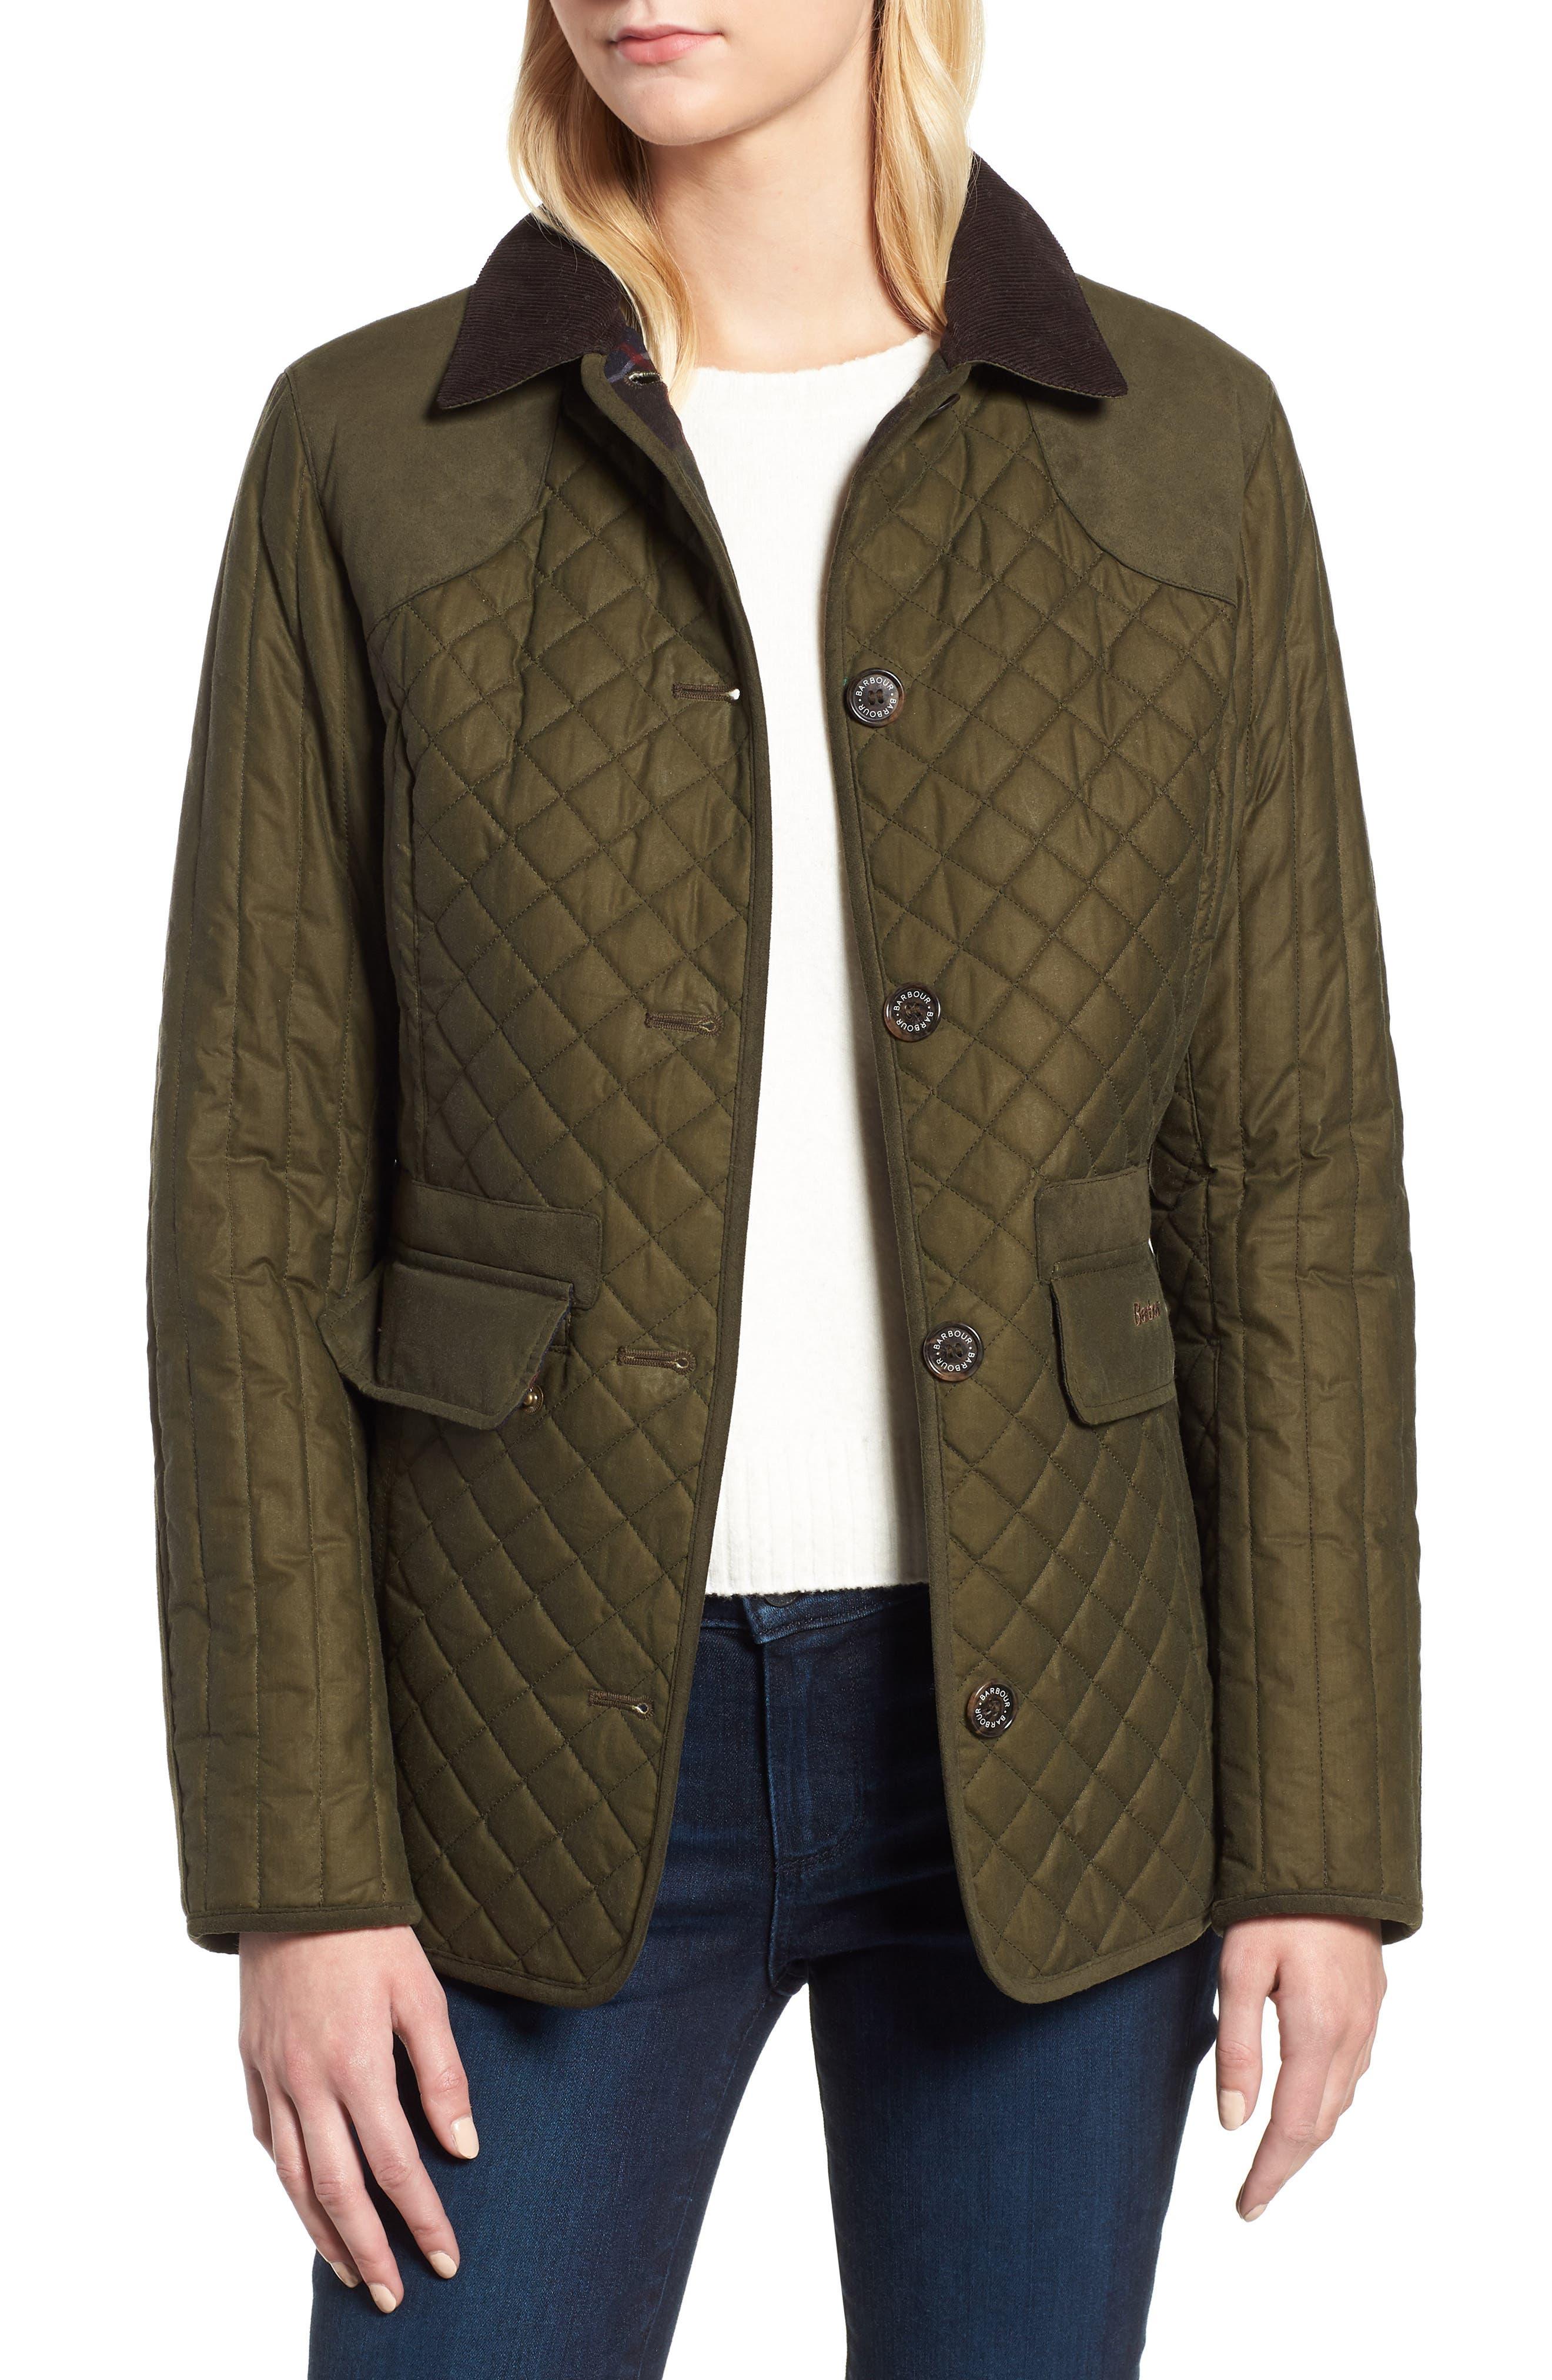 Barbour Dunnock Water Resistant Waxed Cotton Jacket, US / 8 UK - Green